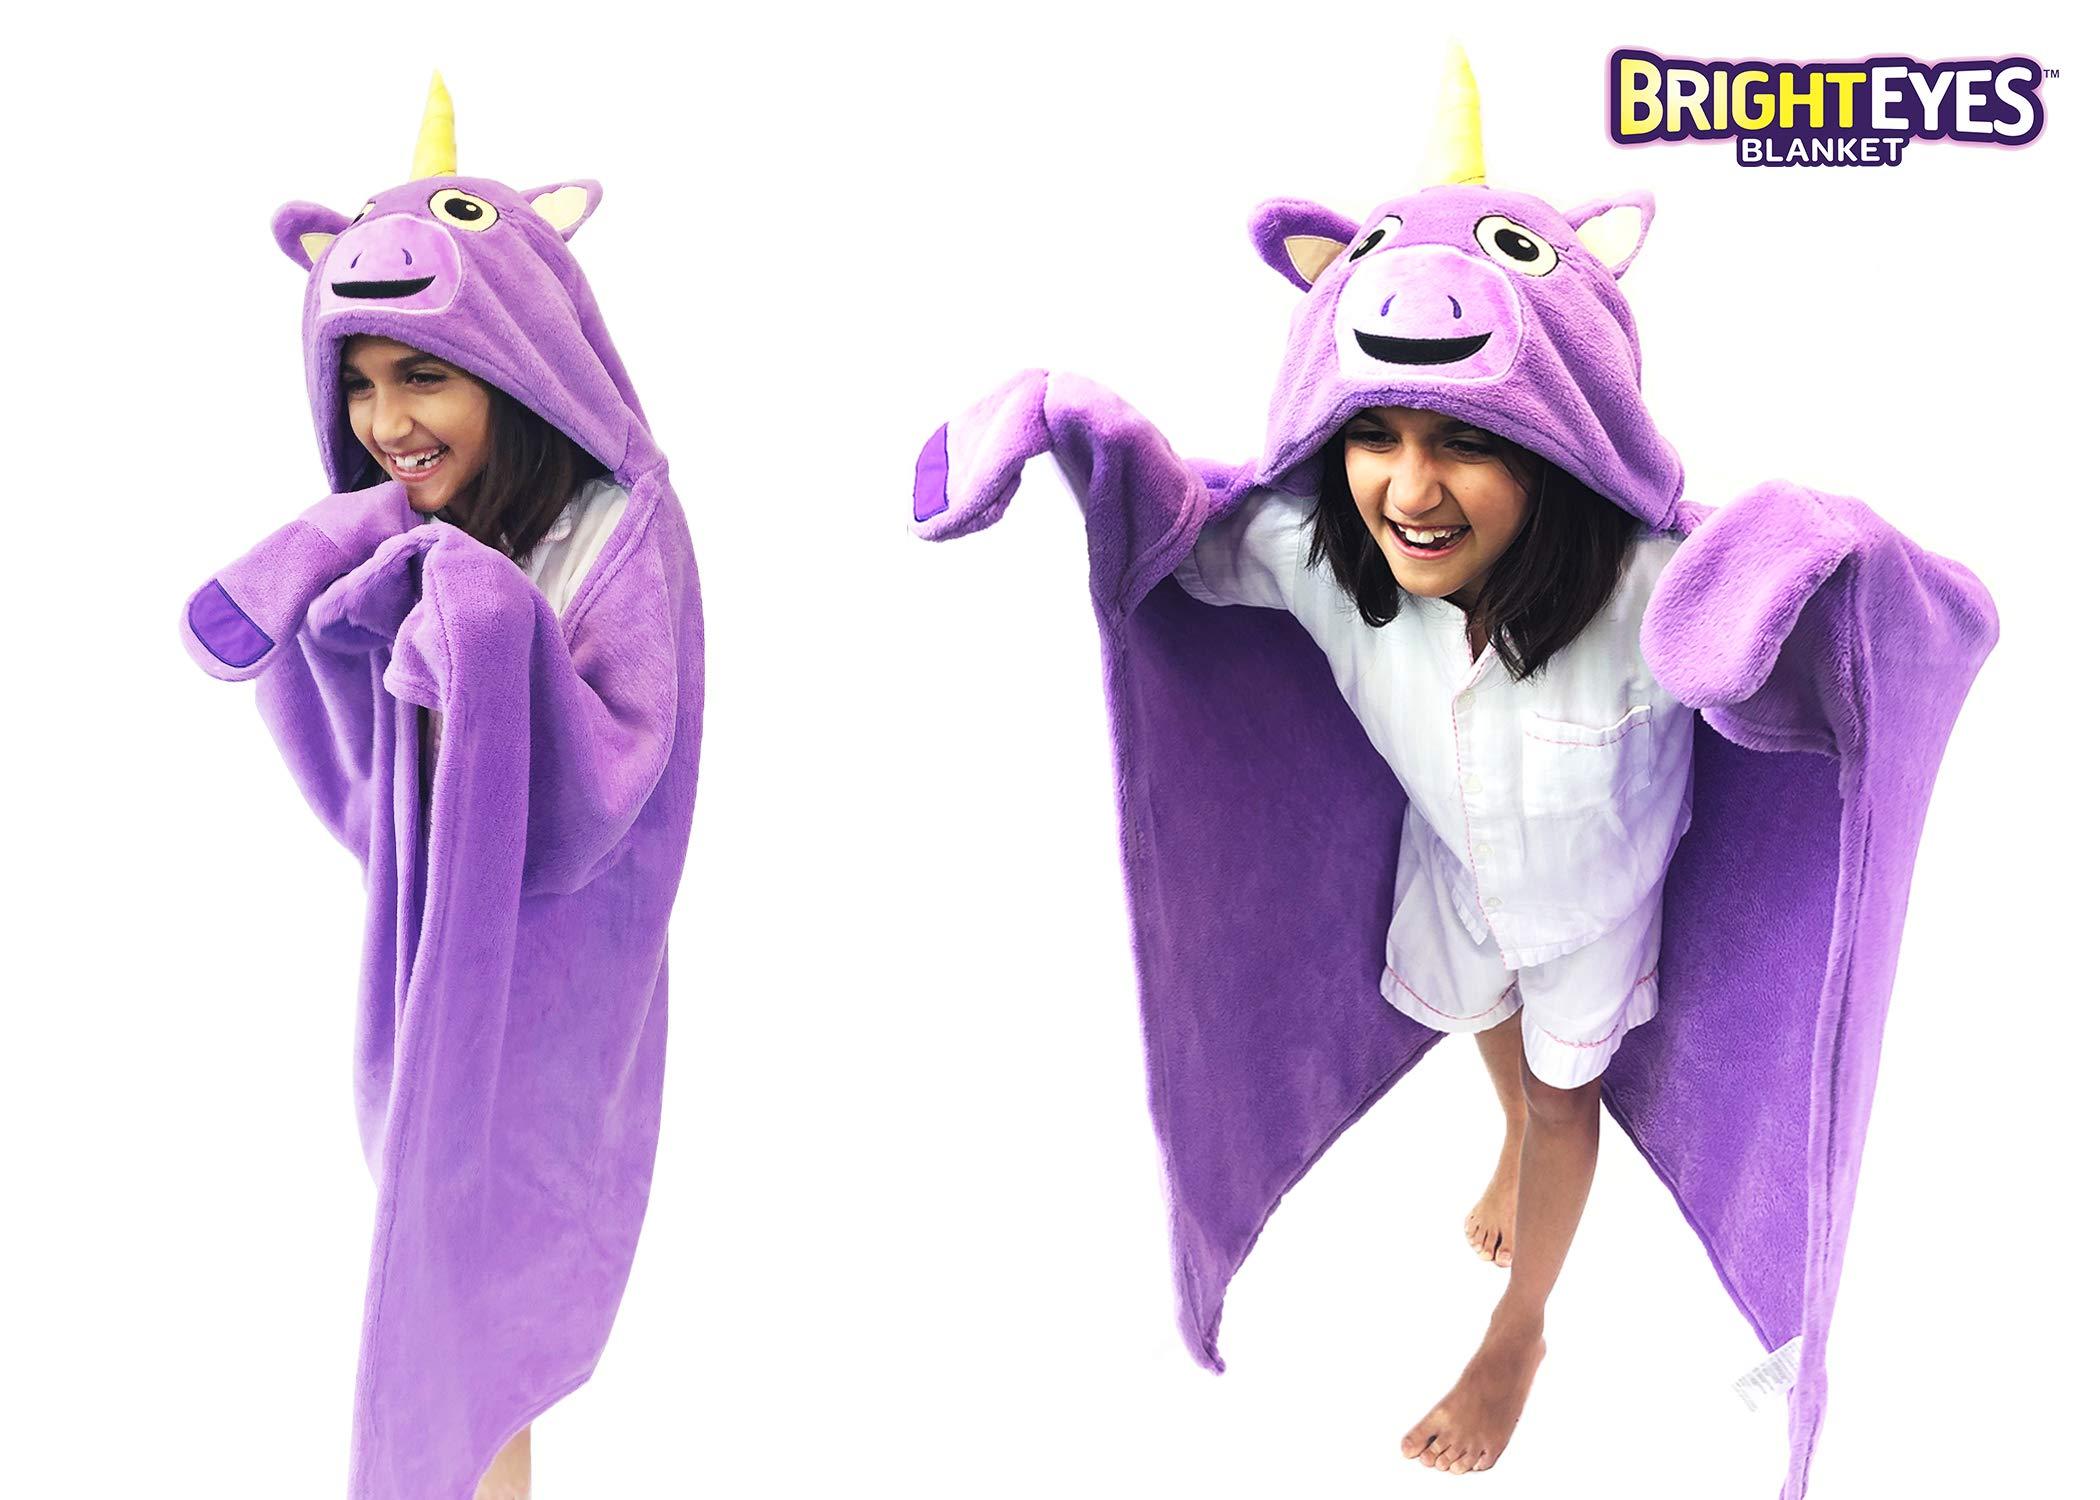 Bright Eyes Blanket - Super Soft Blanket for Kids - Hooded, Blanket, Robe - Comfy Throw Blanket, Purple Unicorn; Warm Fuzzy Blanket, stuffed animal blanket - Machine Washable - Perfect for Sleepovers! by Bright Eyes Blanket